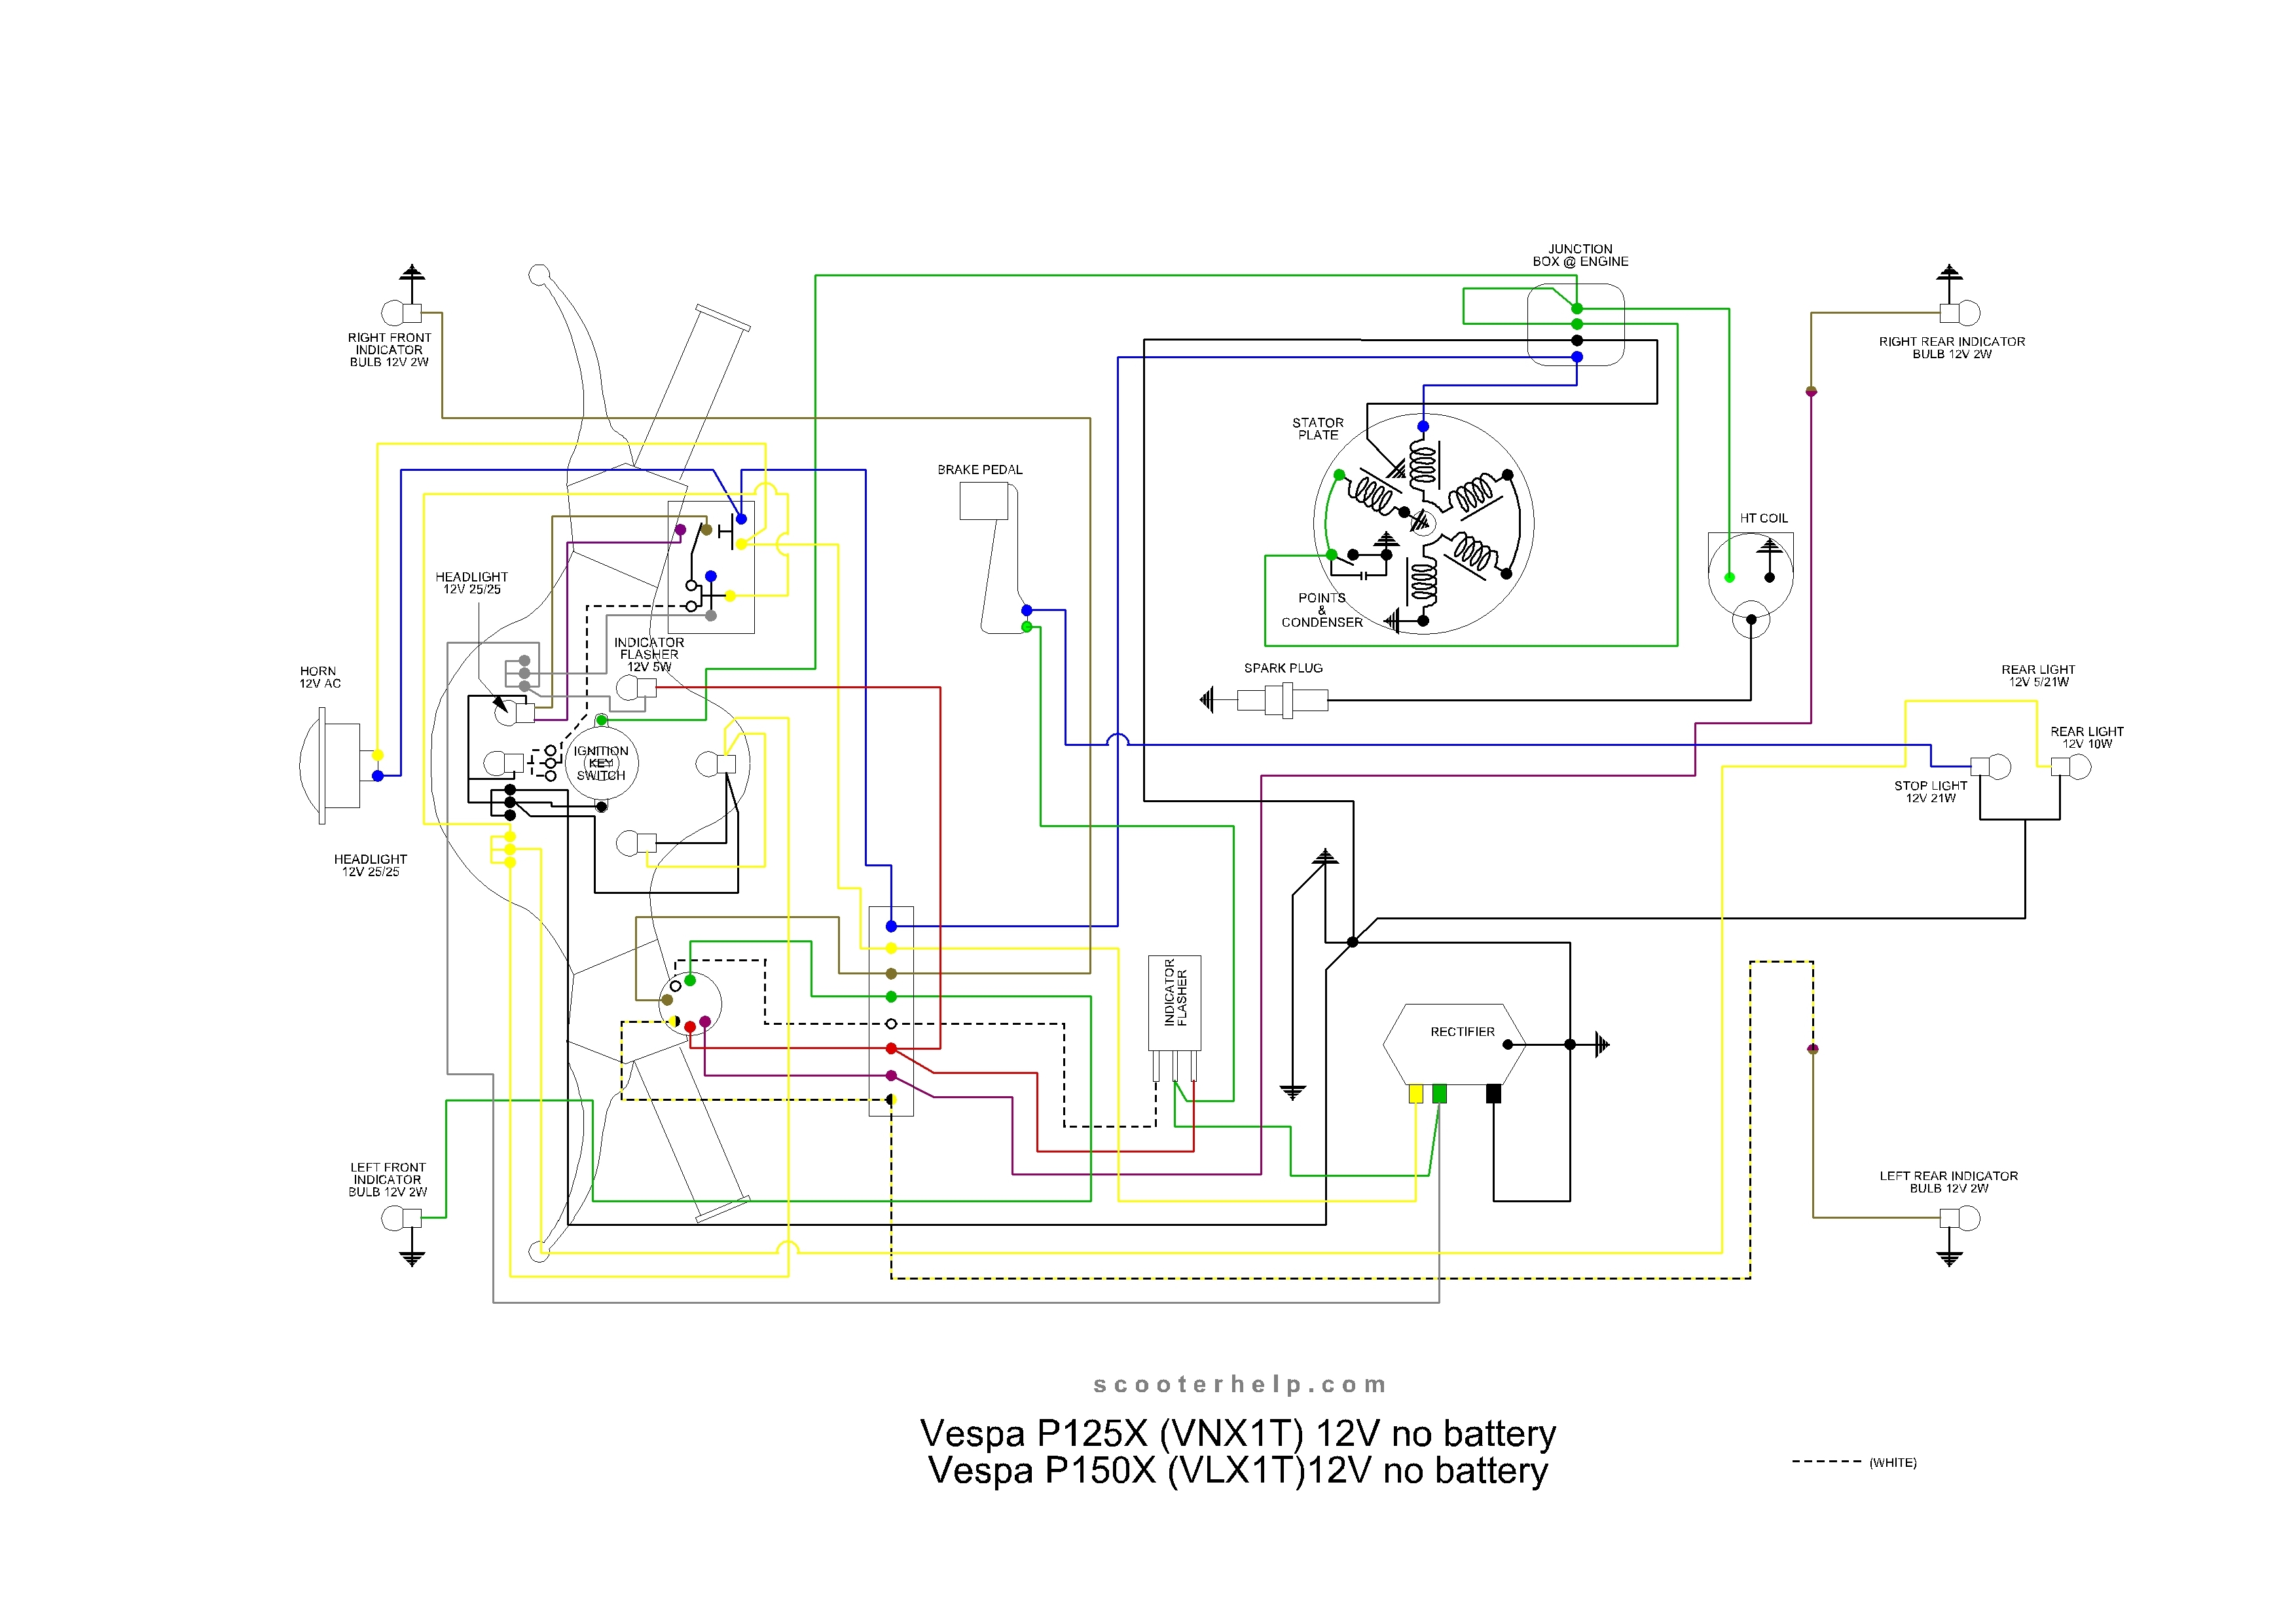 Wiring Diagram Vespa Excel - Wiring Diagram All on